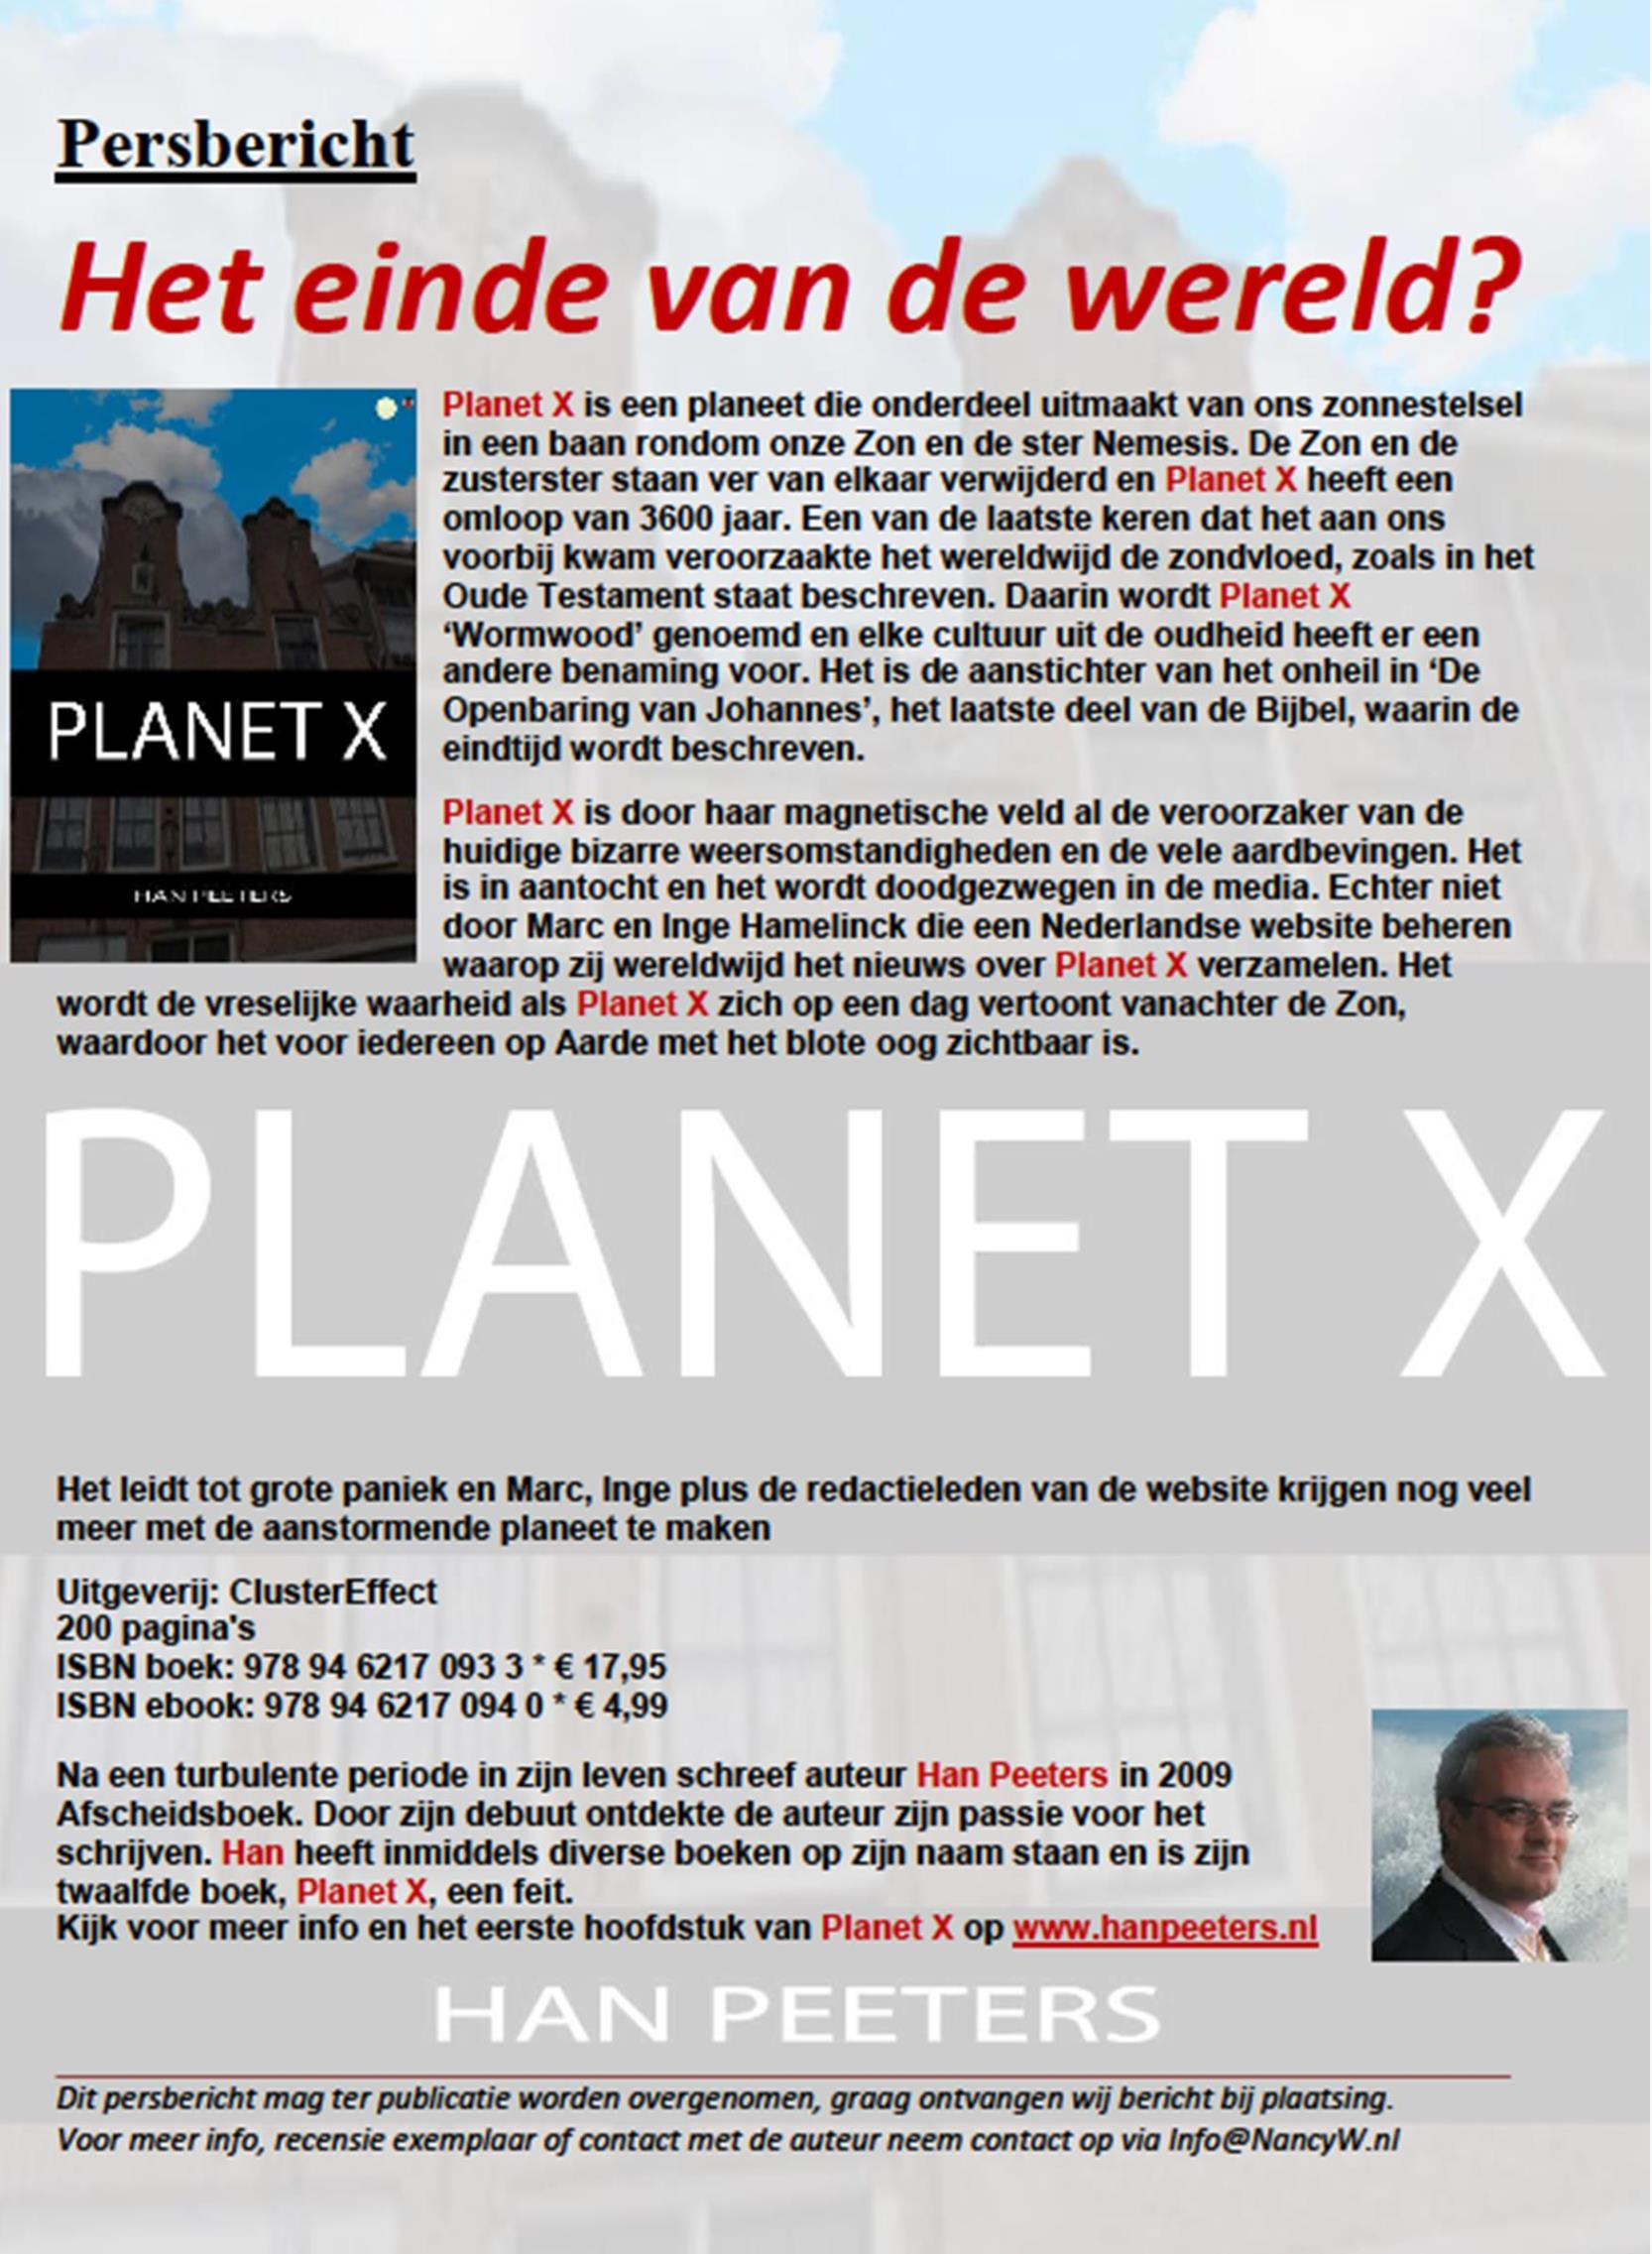 persbericht-planet-x-han-peeters